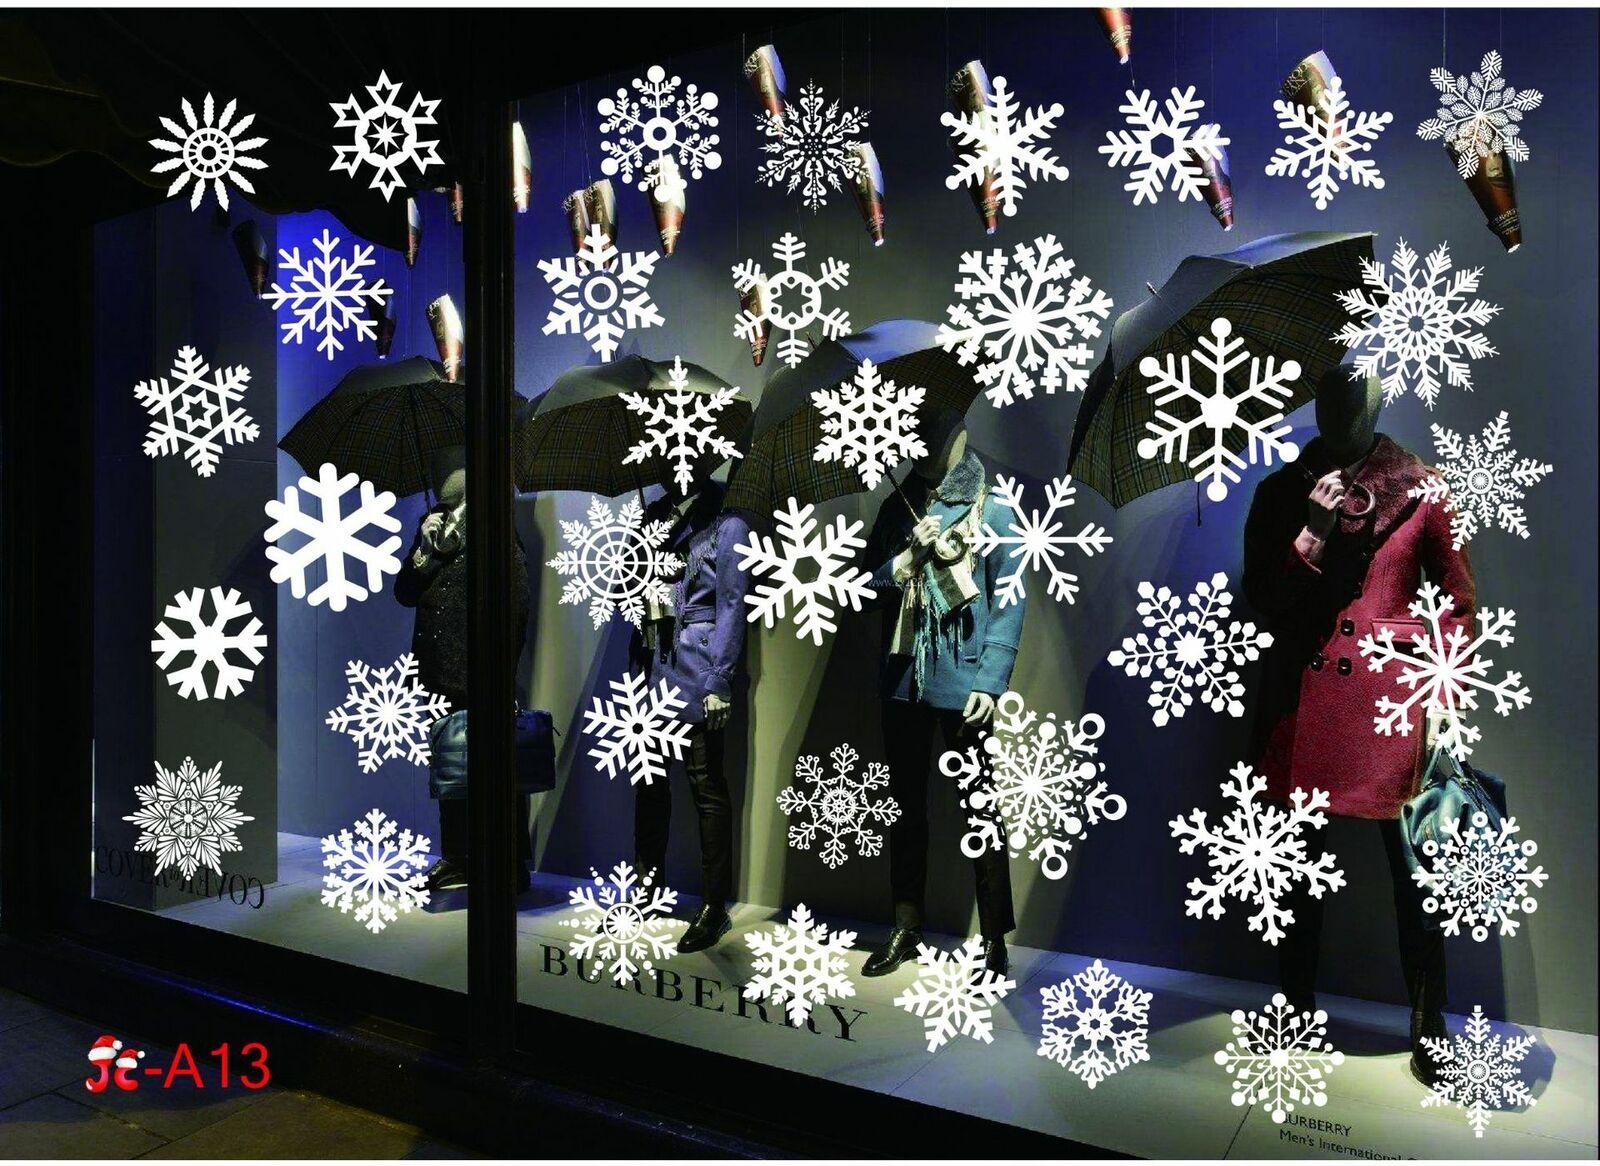 CHRISTMAS STICKERS SANTA SNOWMAN ORNAMENTS SHEET BEAUTIFUL STICKERS#SANTA28